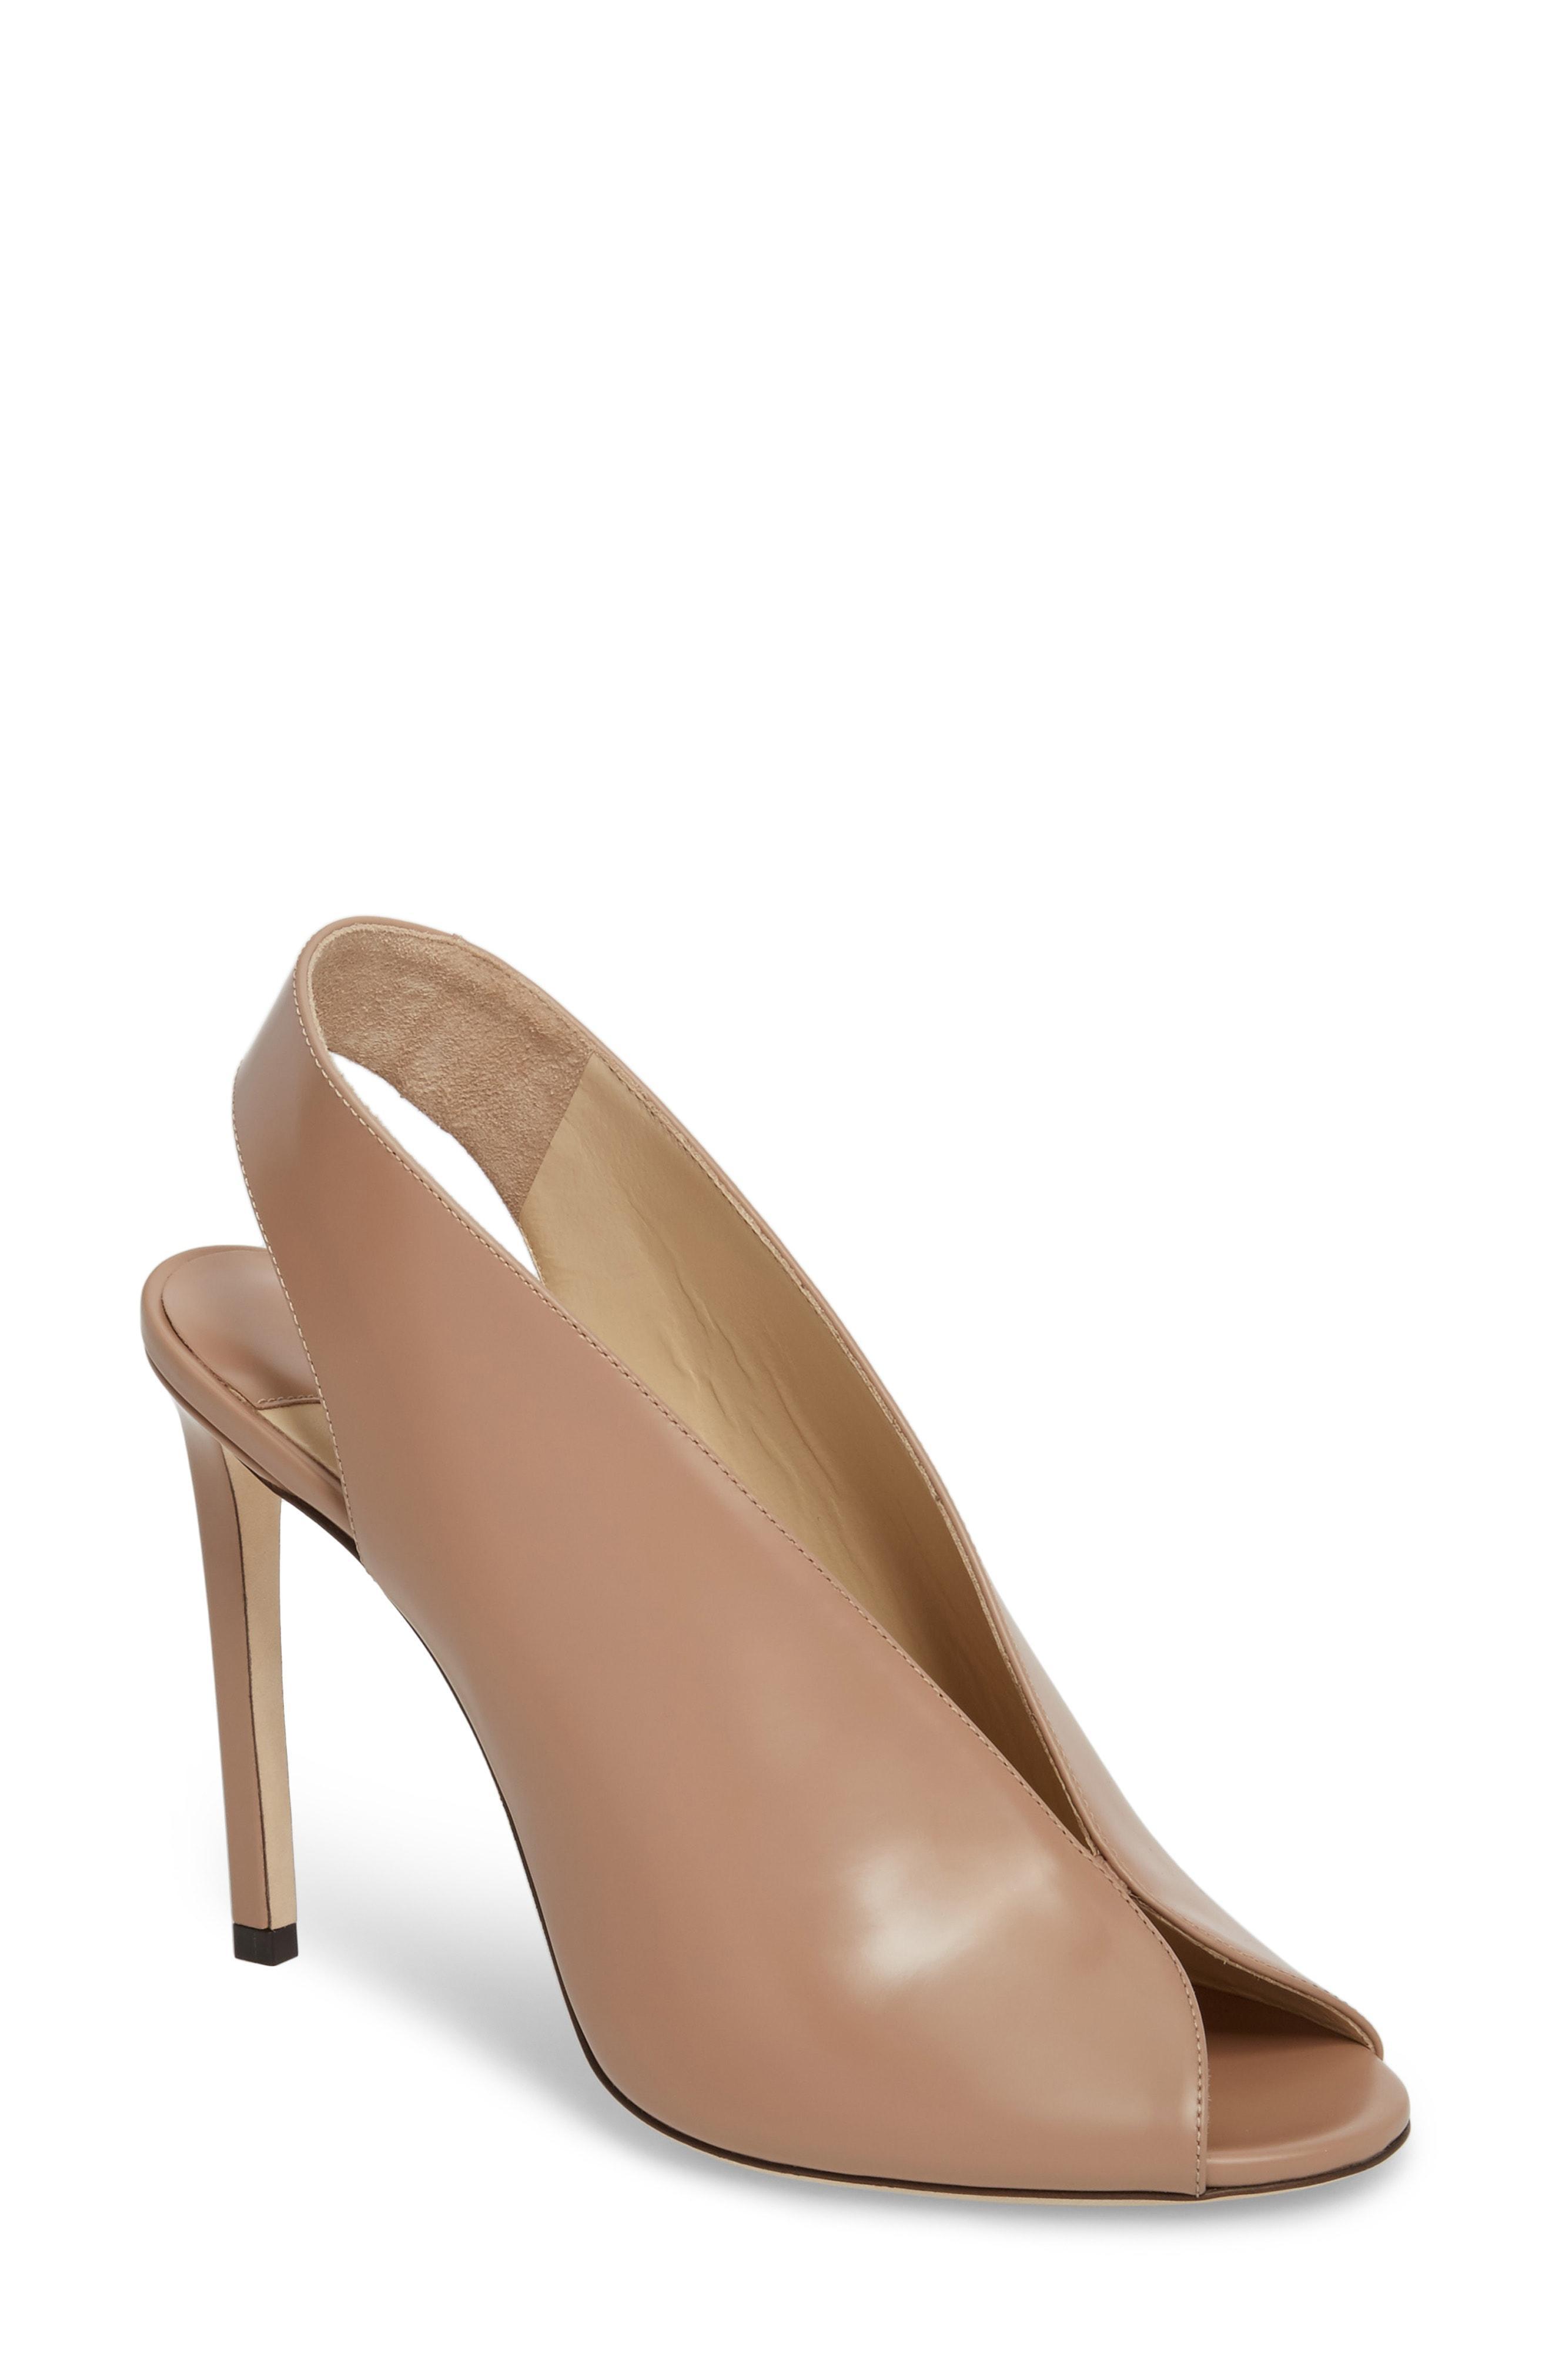 4fb3c151bd9f Jimmy Choo Shar 85 Ballet Pink Liquid Leather Sandal Booties